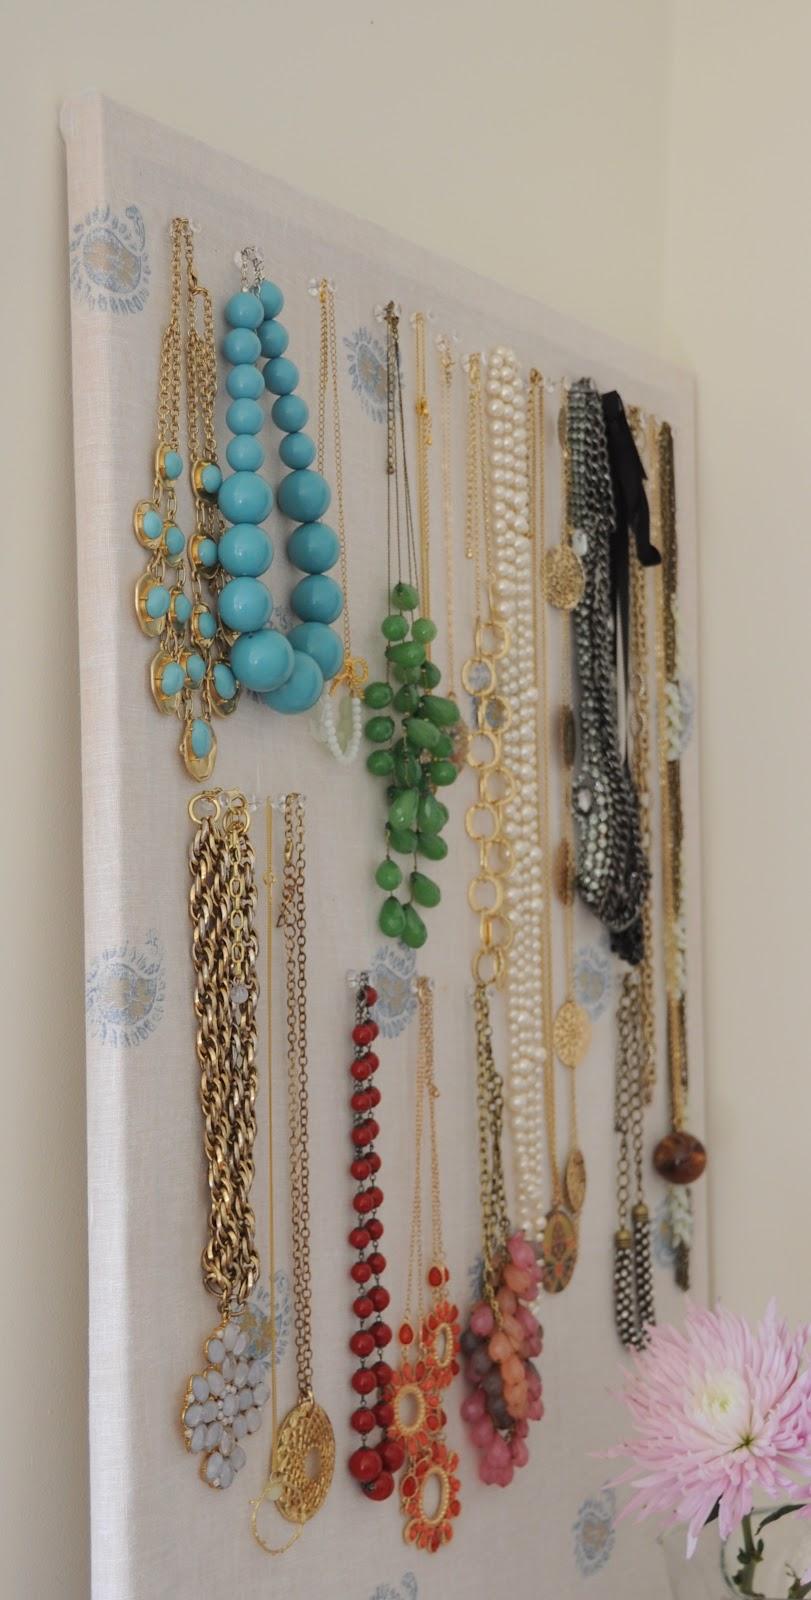 deliciously organized DIY Organize Necklaces on CorkBoard